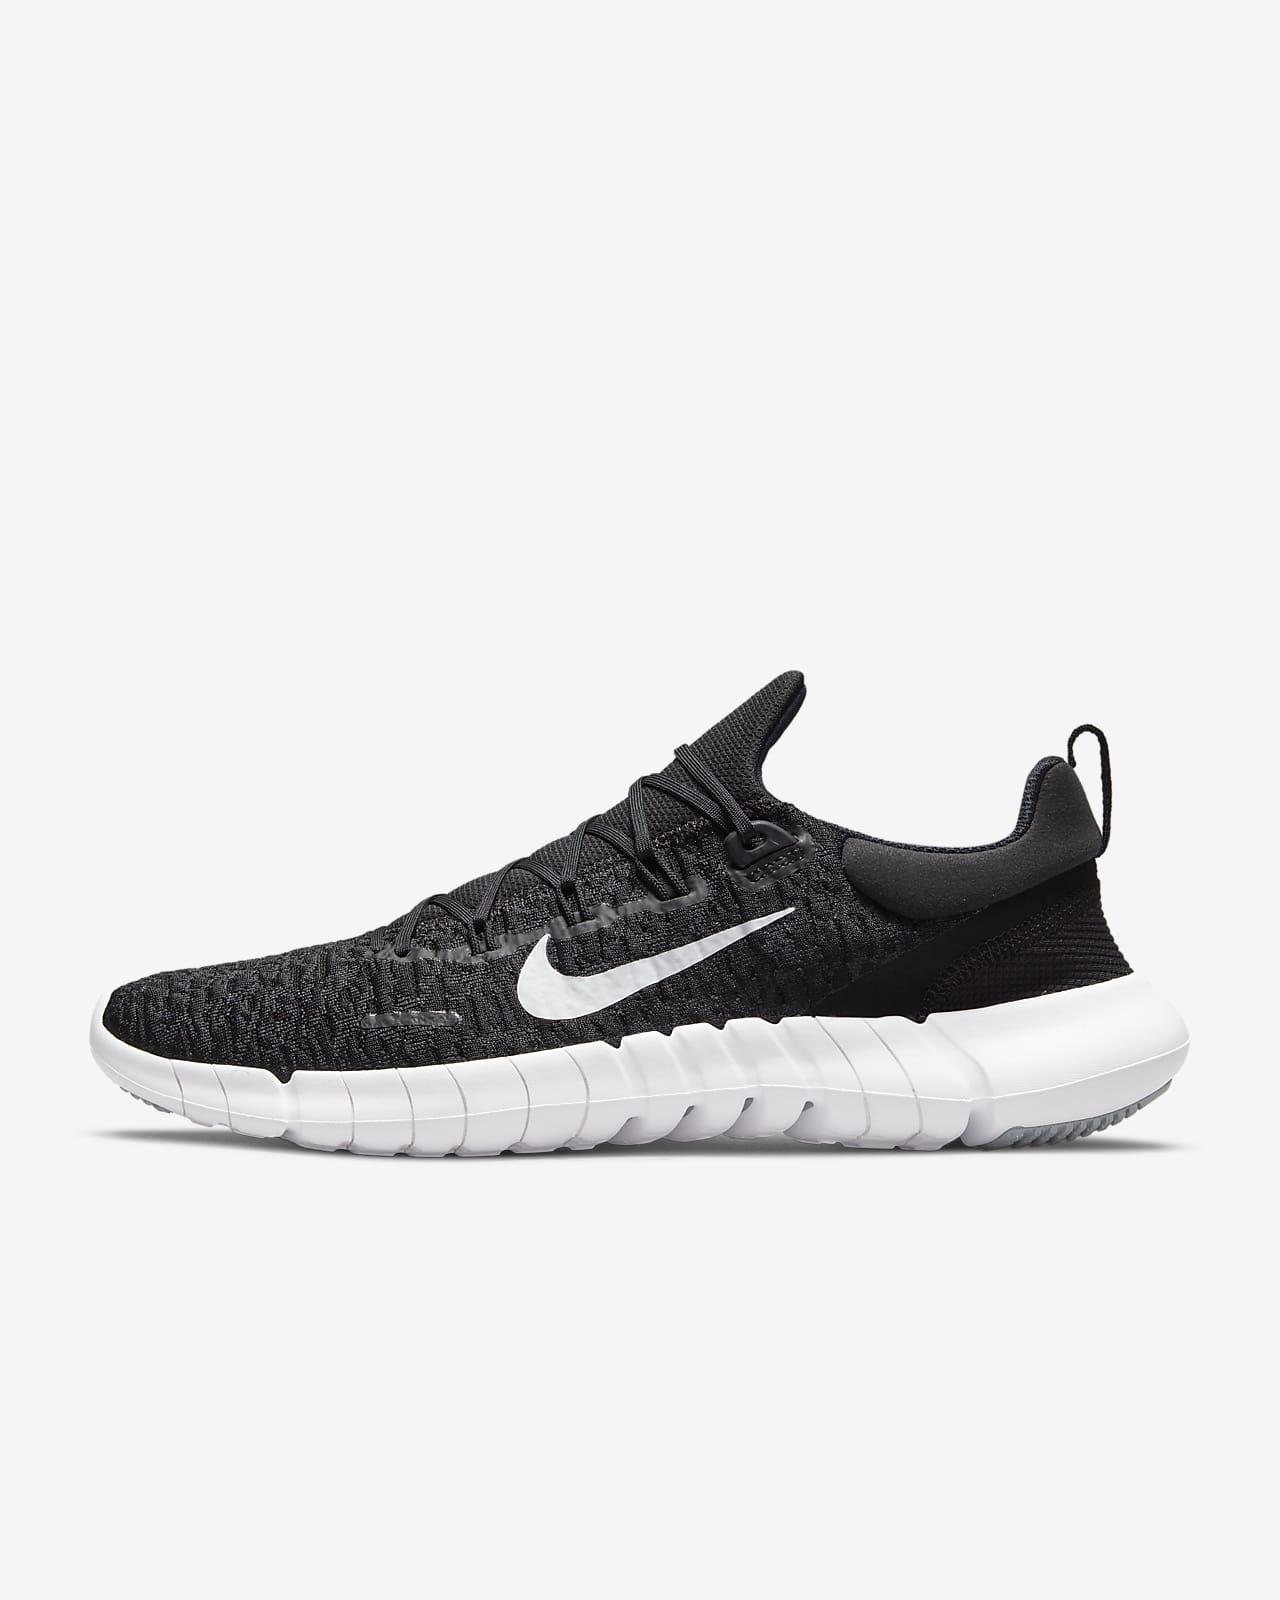 Nike Free Run 5.0 Men's Road Running Shoes